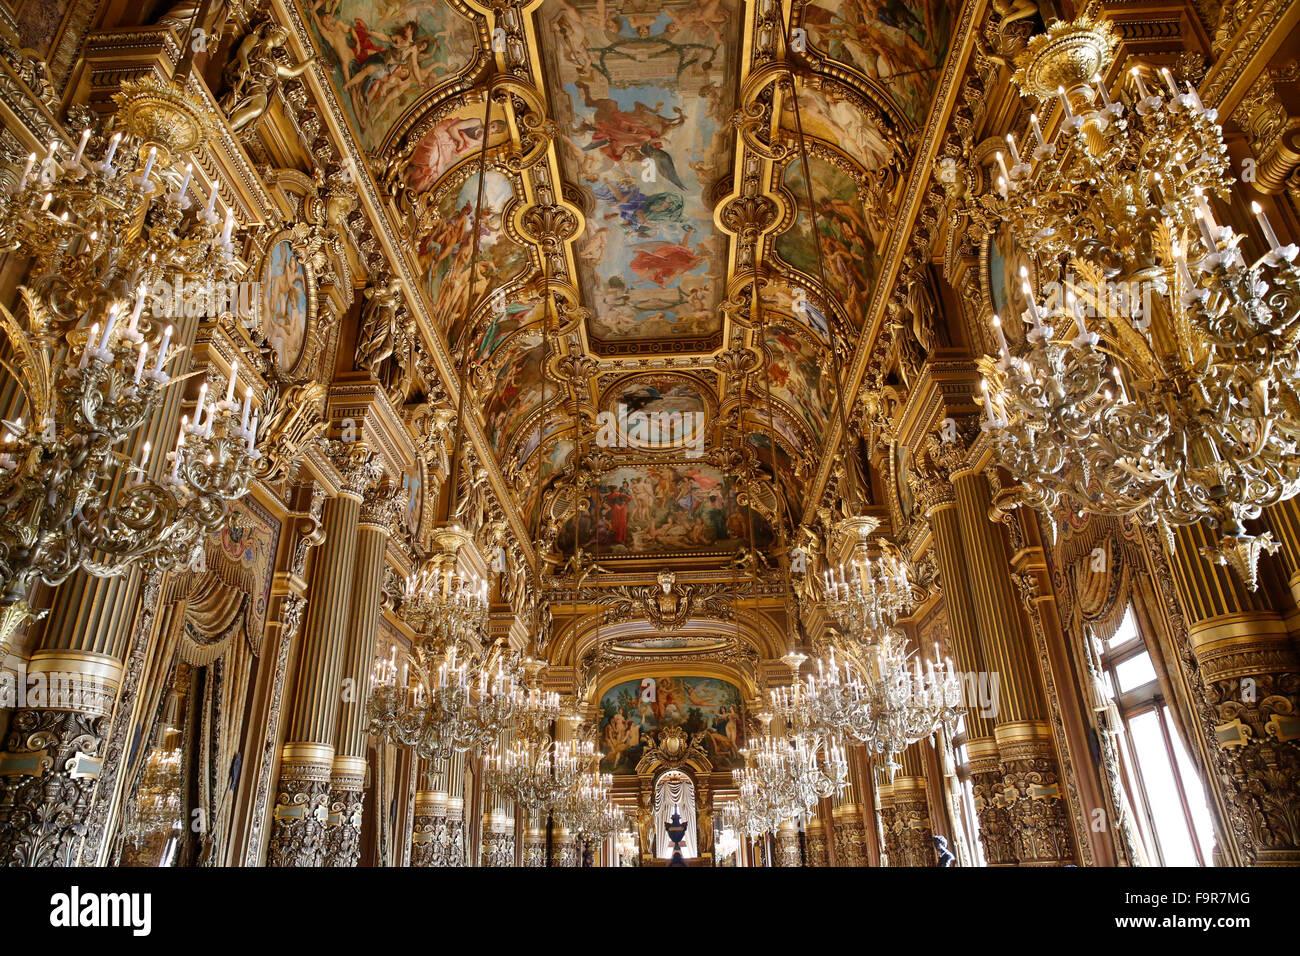 Palais Garnier. Paris Opera. Celling of the Grand Foyer. - Stock Image